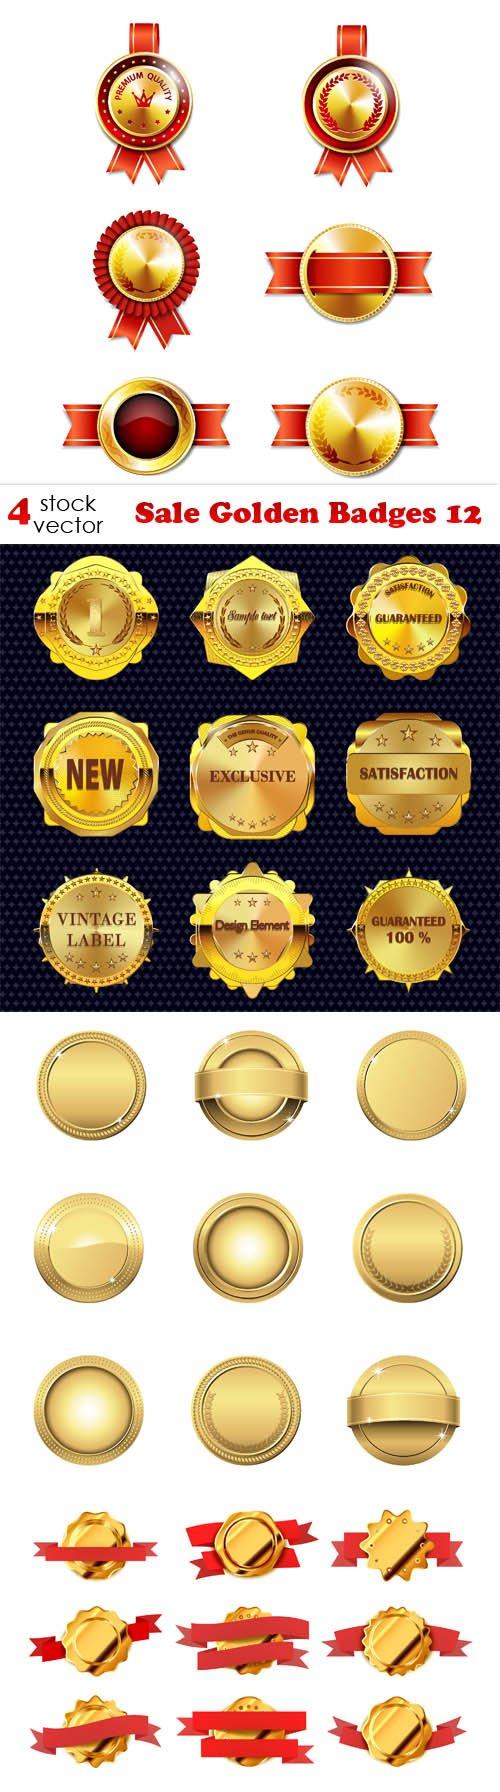 Vectors - Sale Golden Badges 12